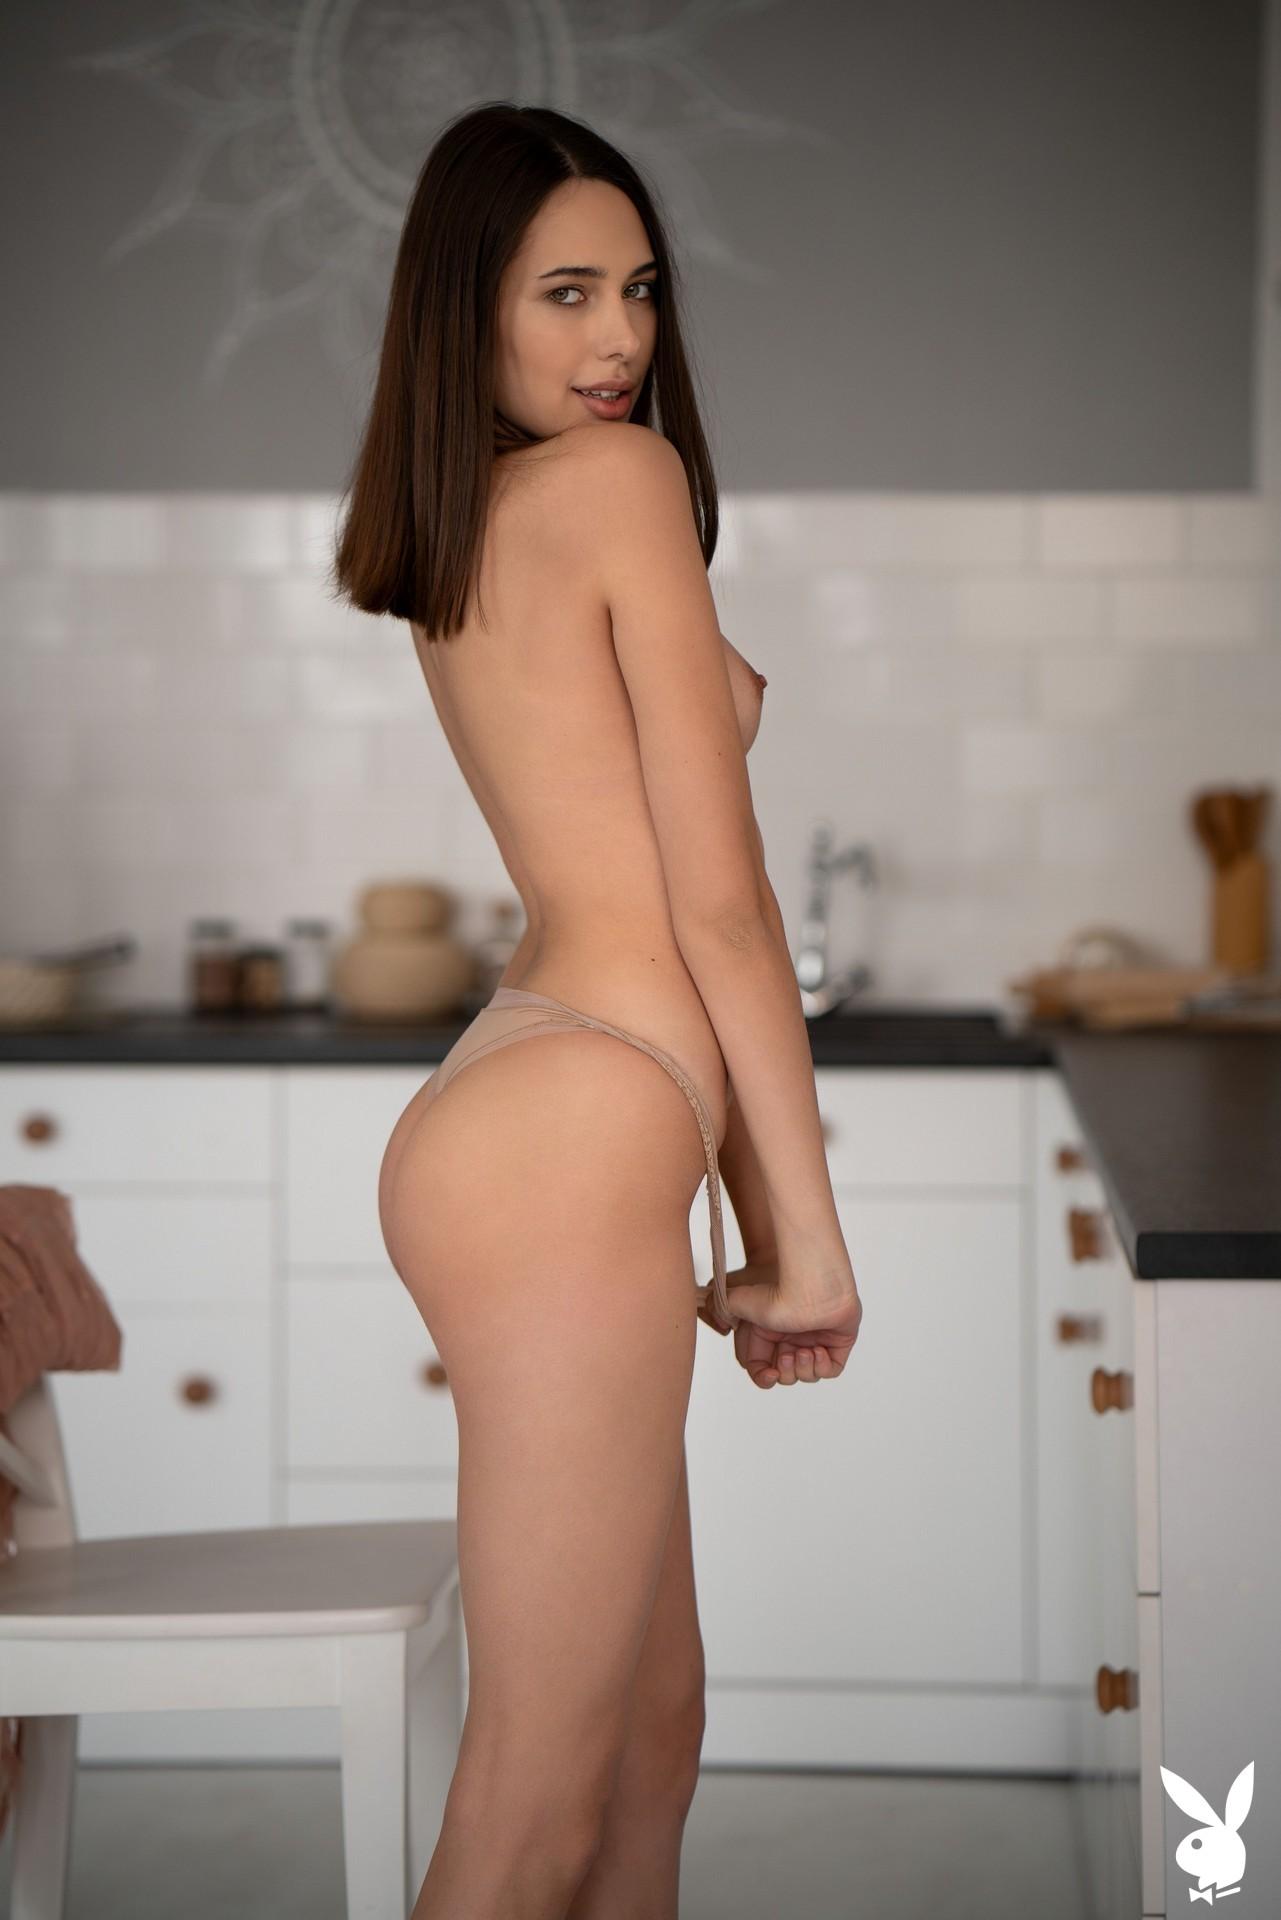 Katrine Pirs In Essence Of Life Playboy Plus (15)